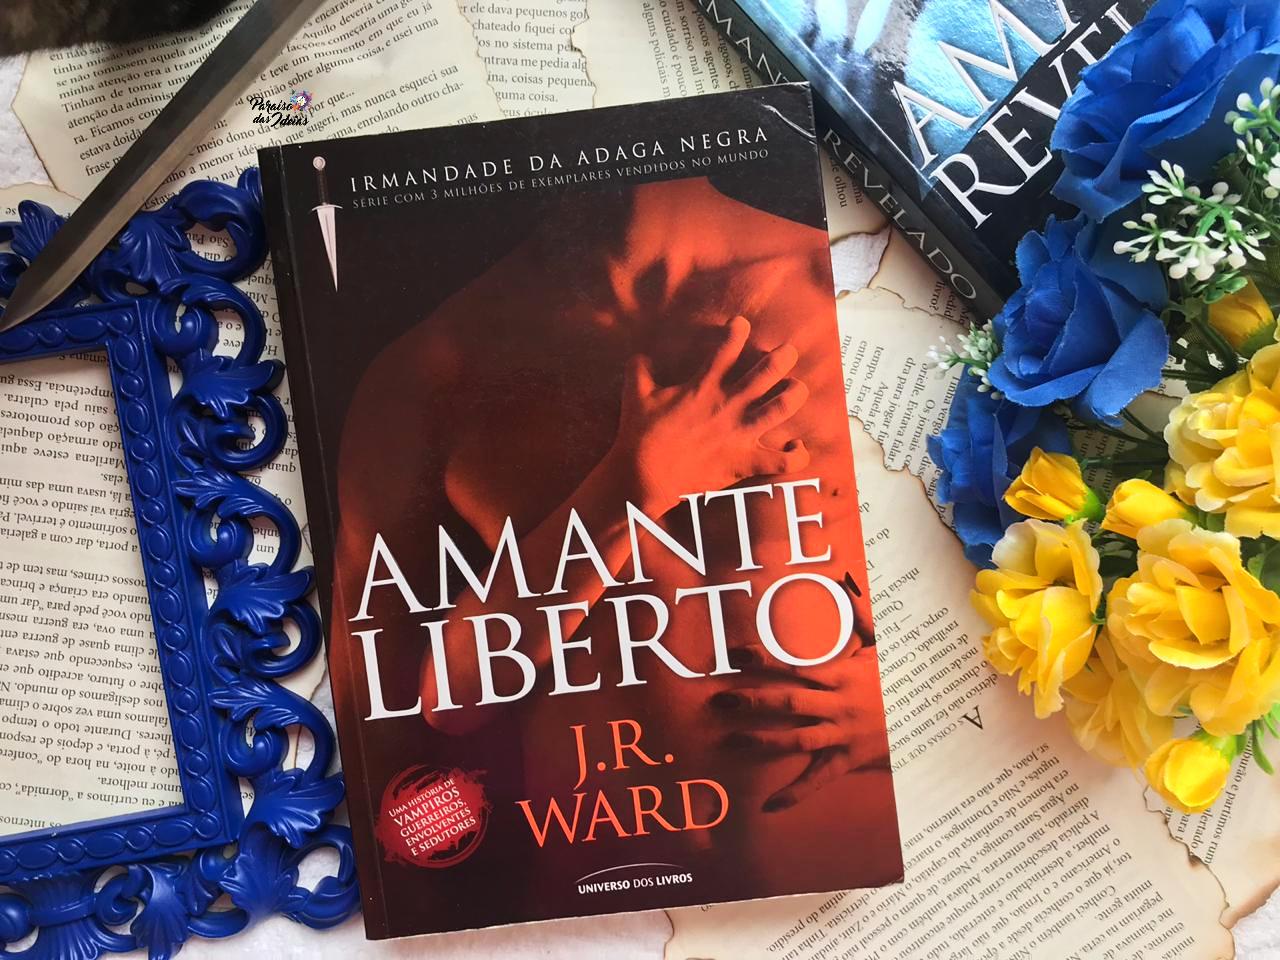 [Resenha] Amante Sombrio - Livro 01 - J.R.Ward